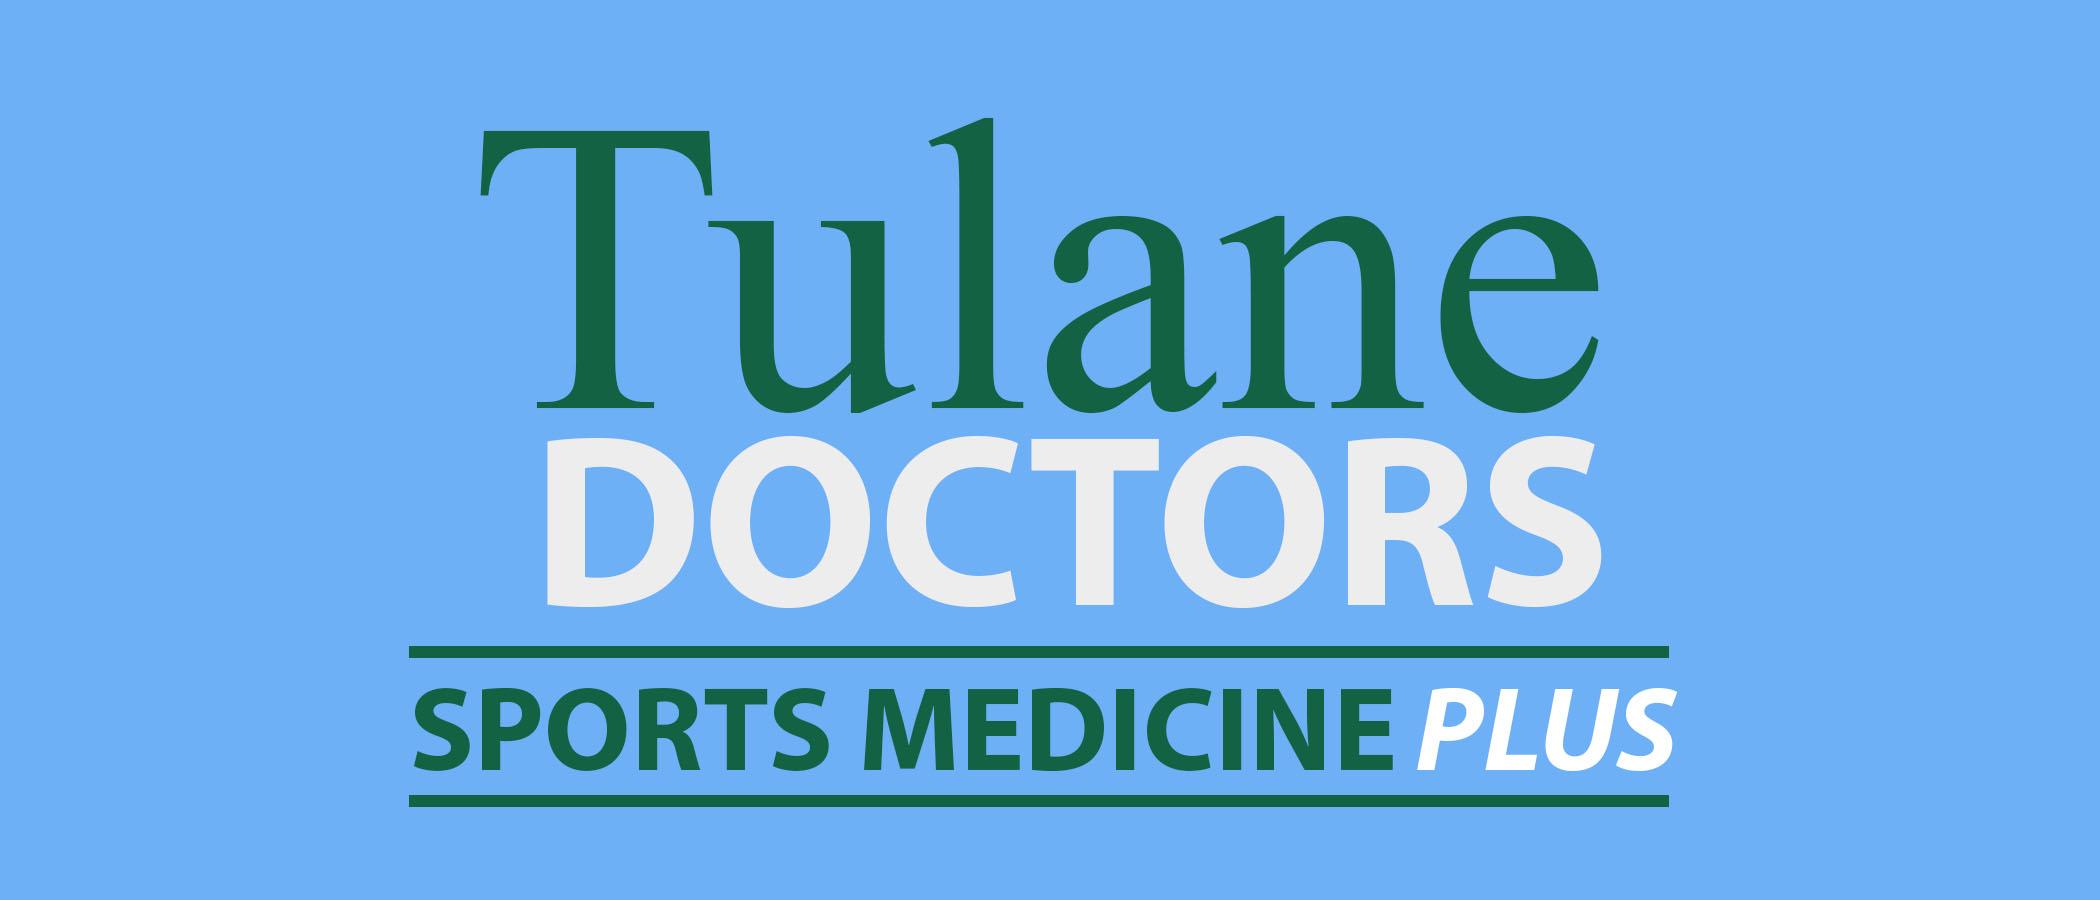 Tulane Doctors-1.jpg